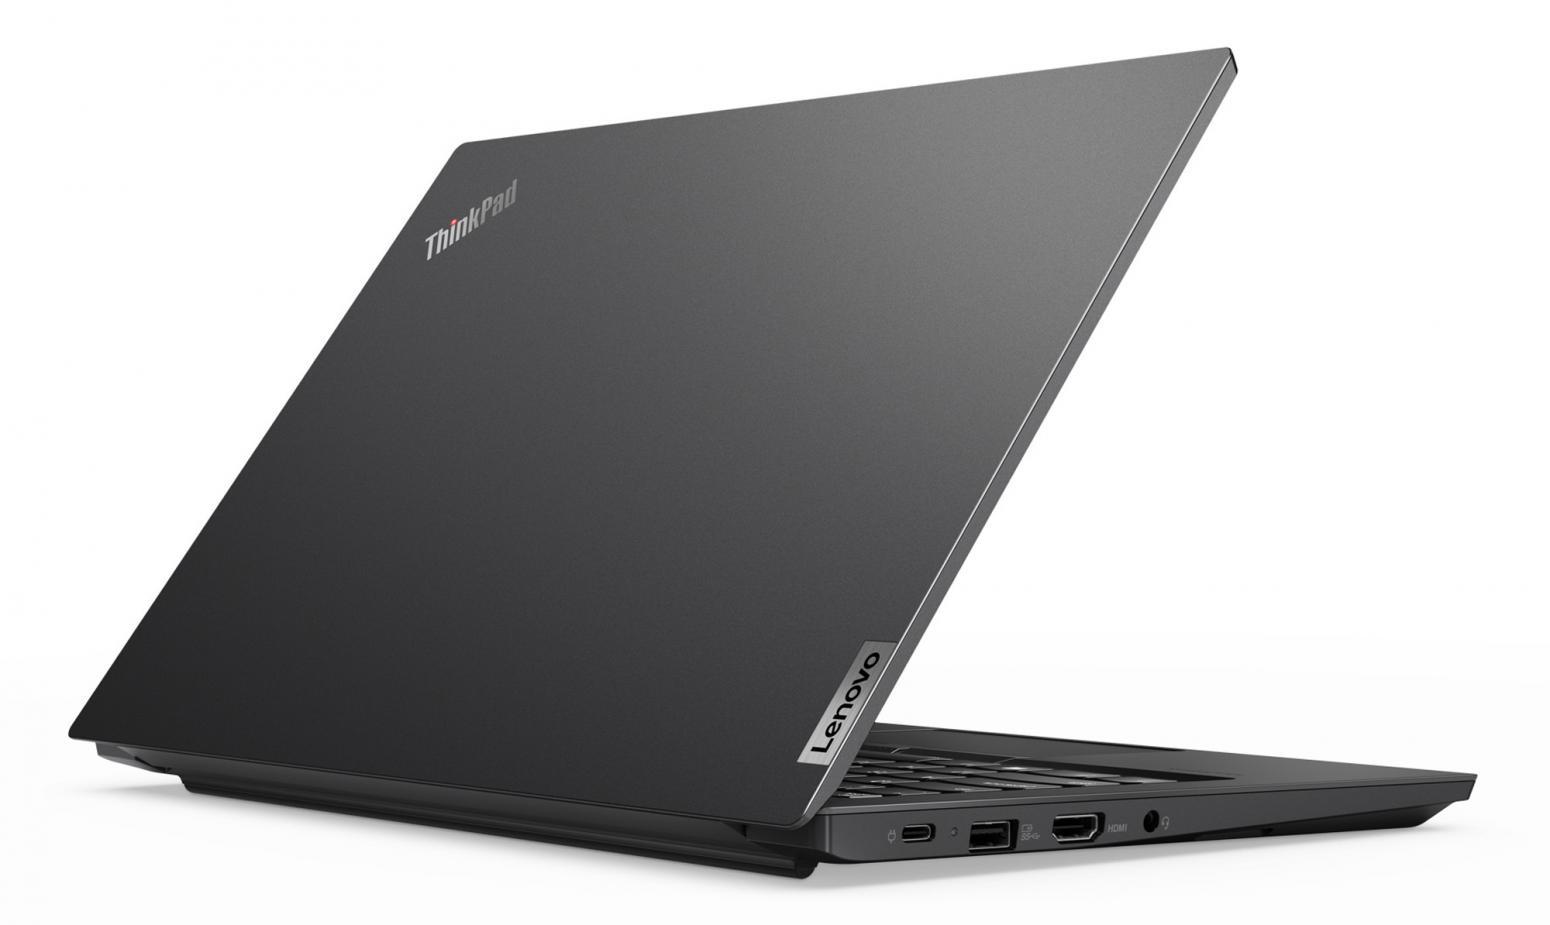 Ordinateur portable Lenovo ThinkPad E14 AMD Gen 3 (20Y7003RFR) Argent - Ryzen 5, Pro - photo 3